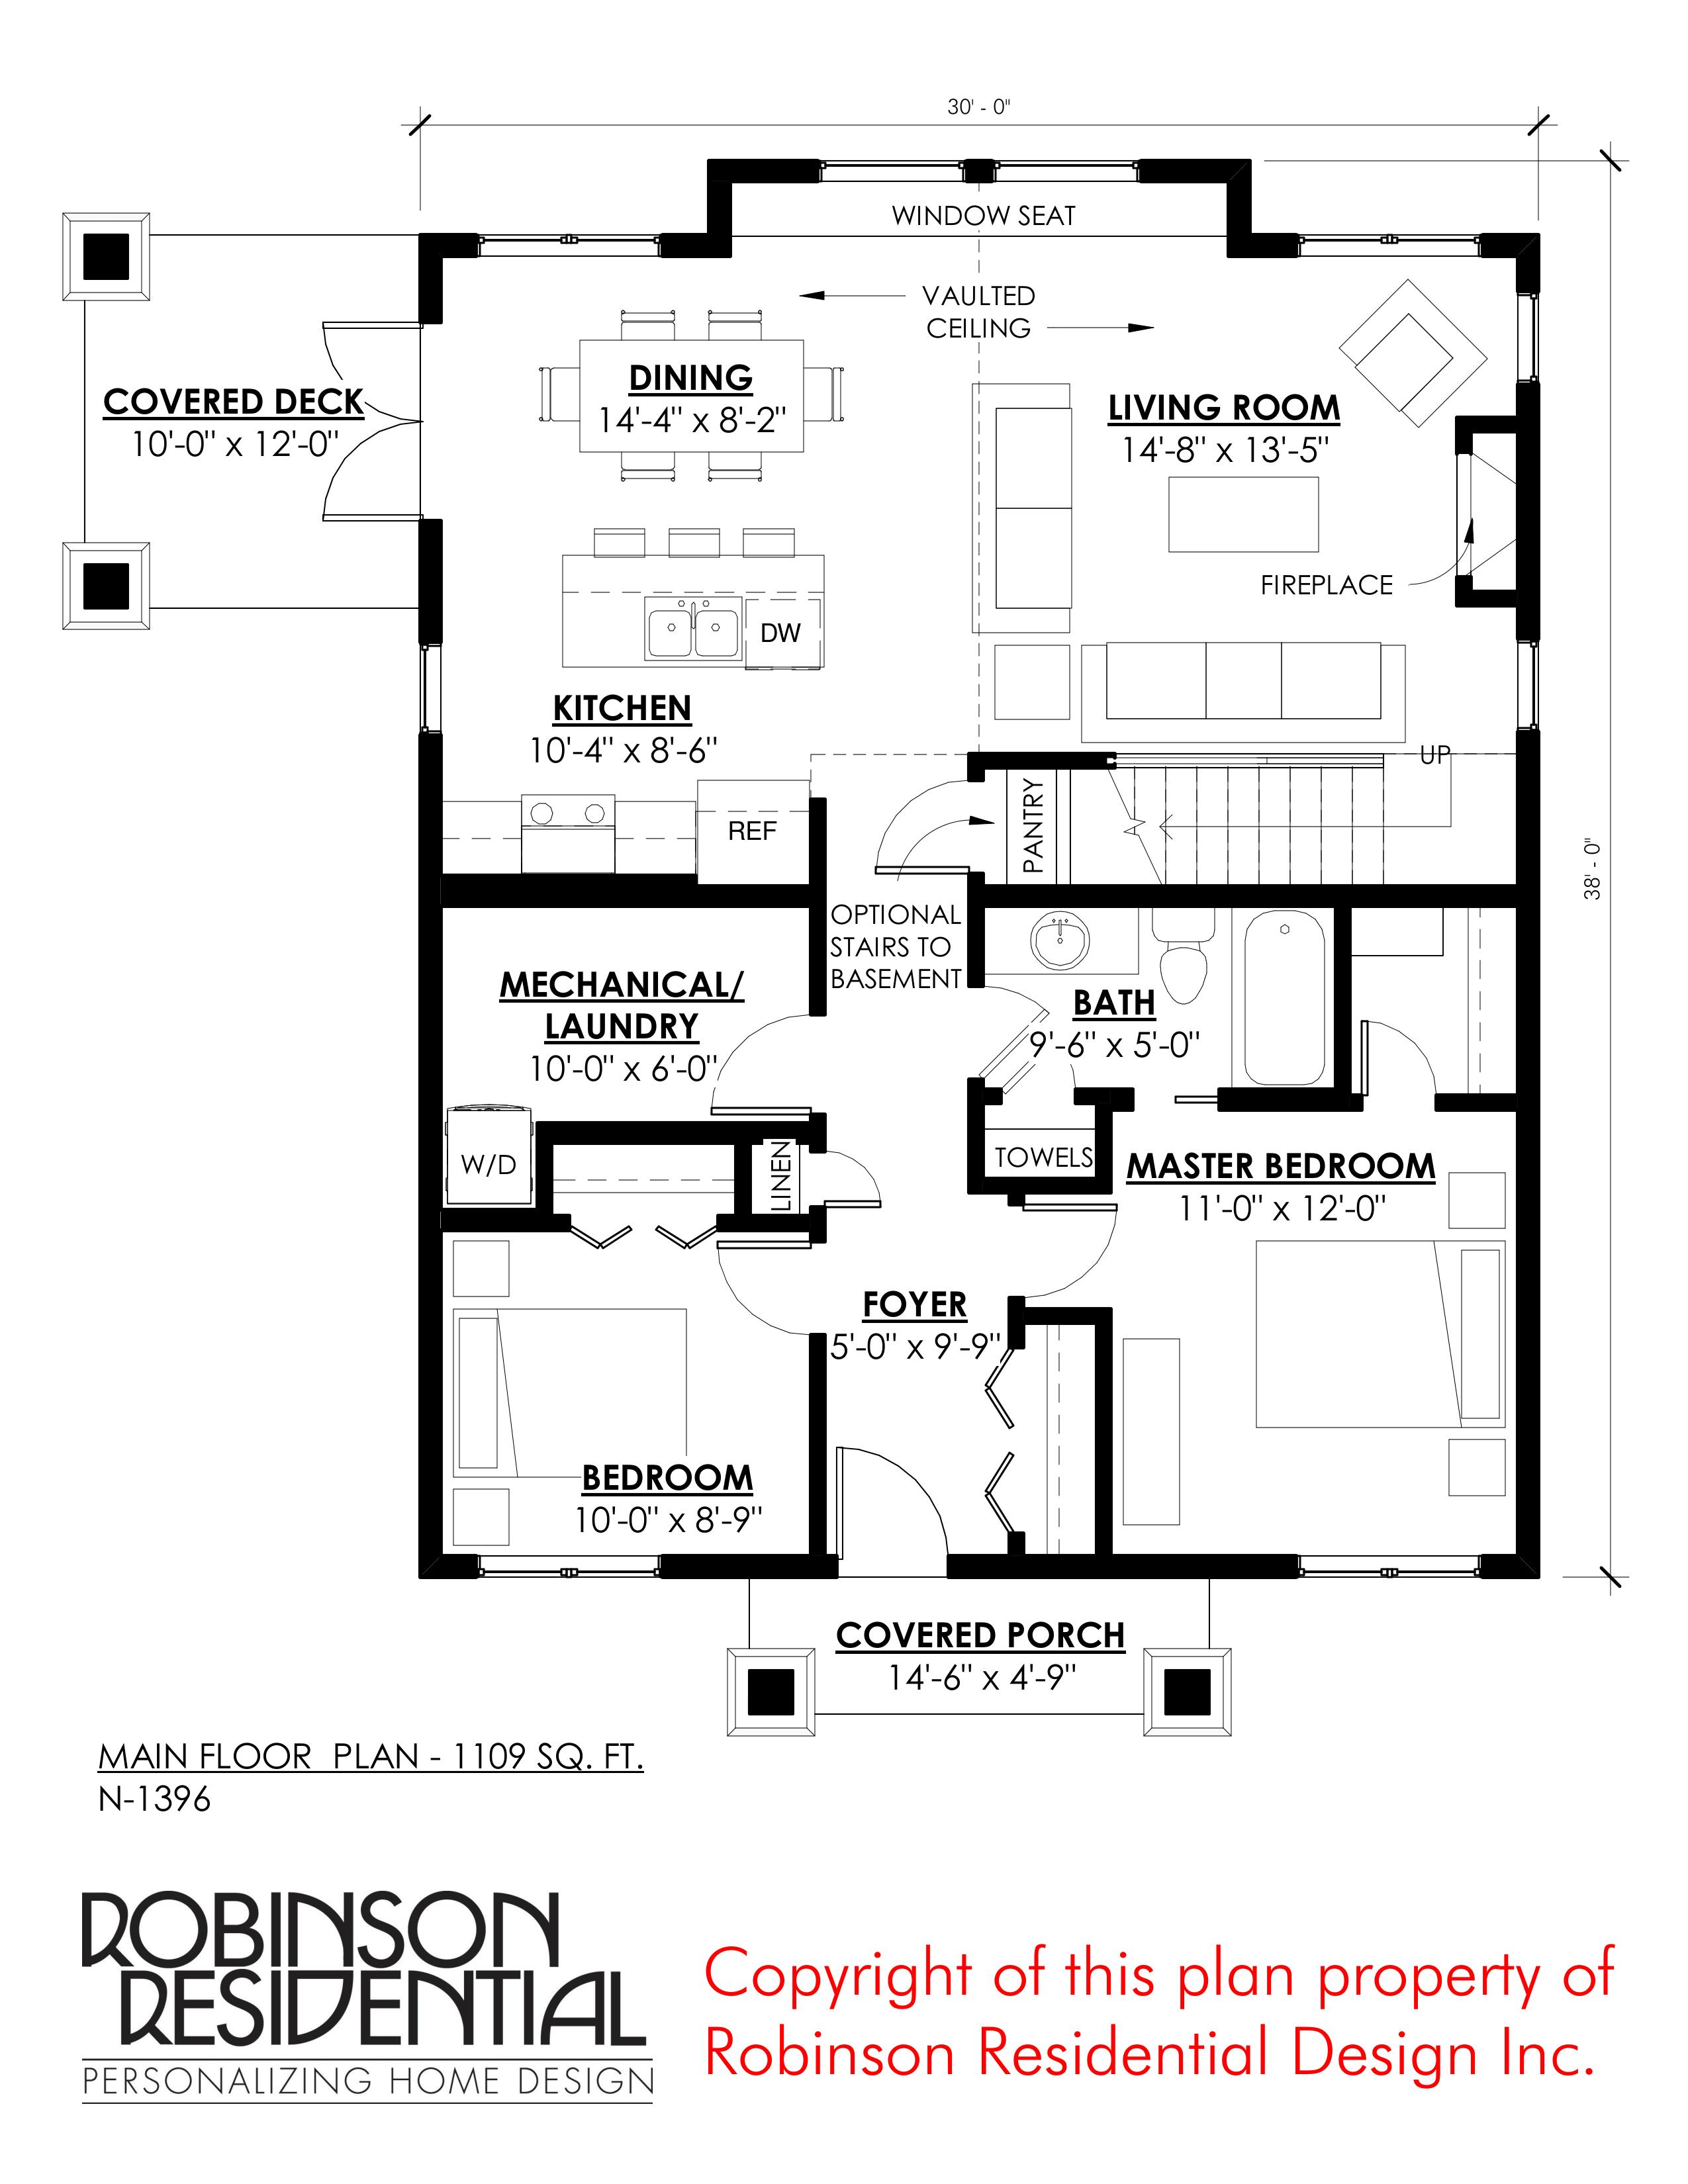 Craftsman n 1396 robinson plans for Sip house plans craftsman